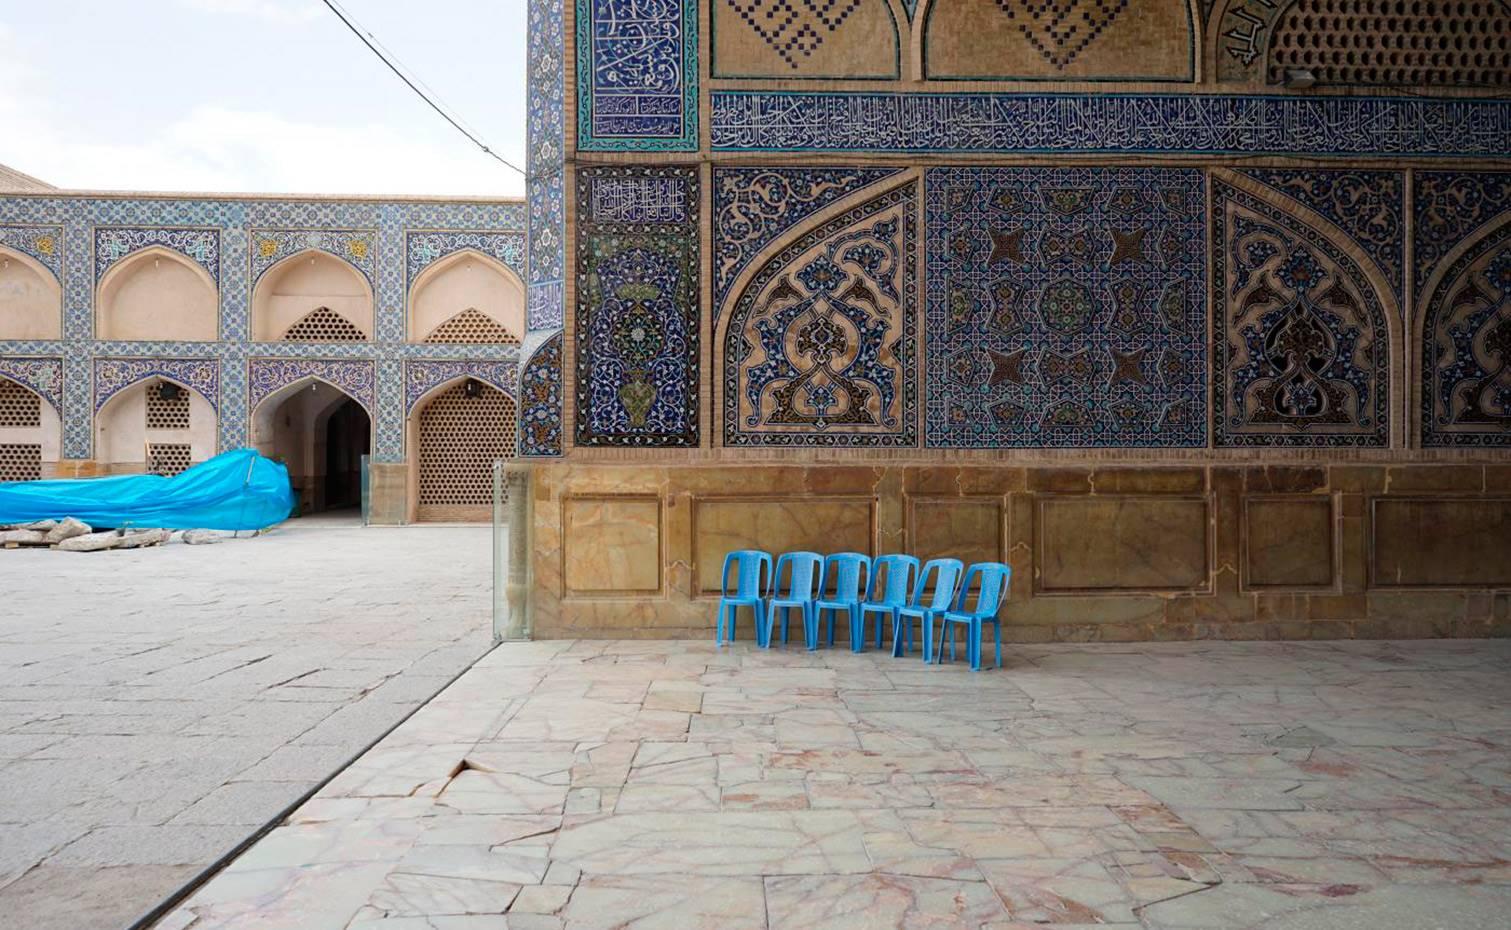 Imagen deFarah Ebrahimi (e15).